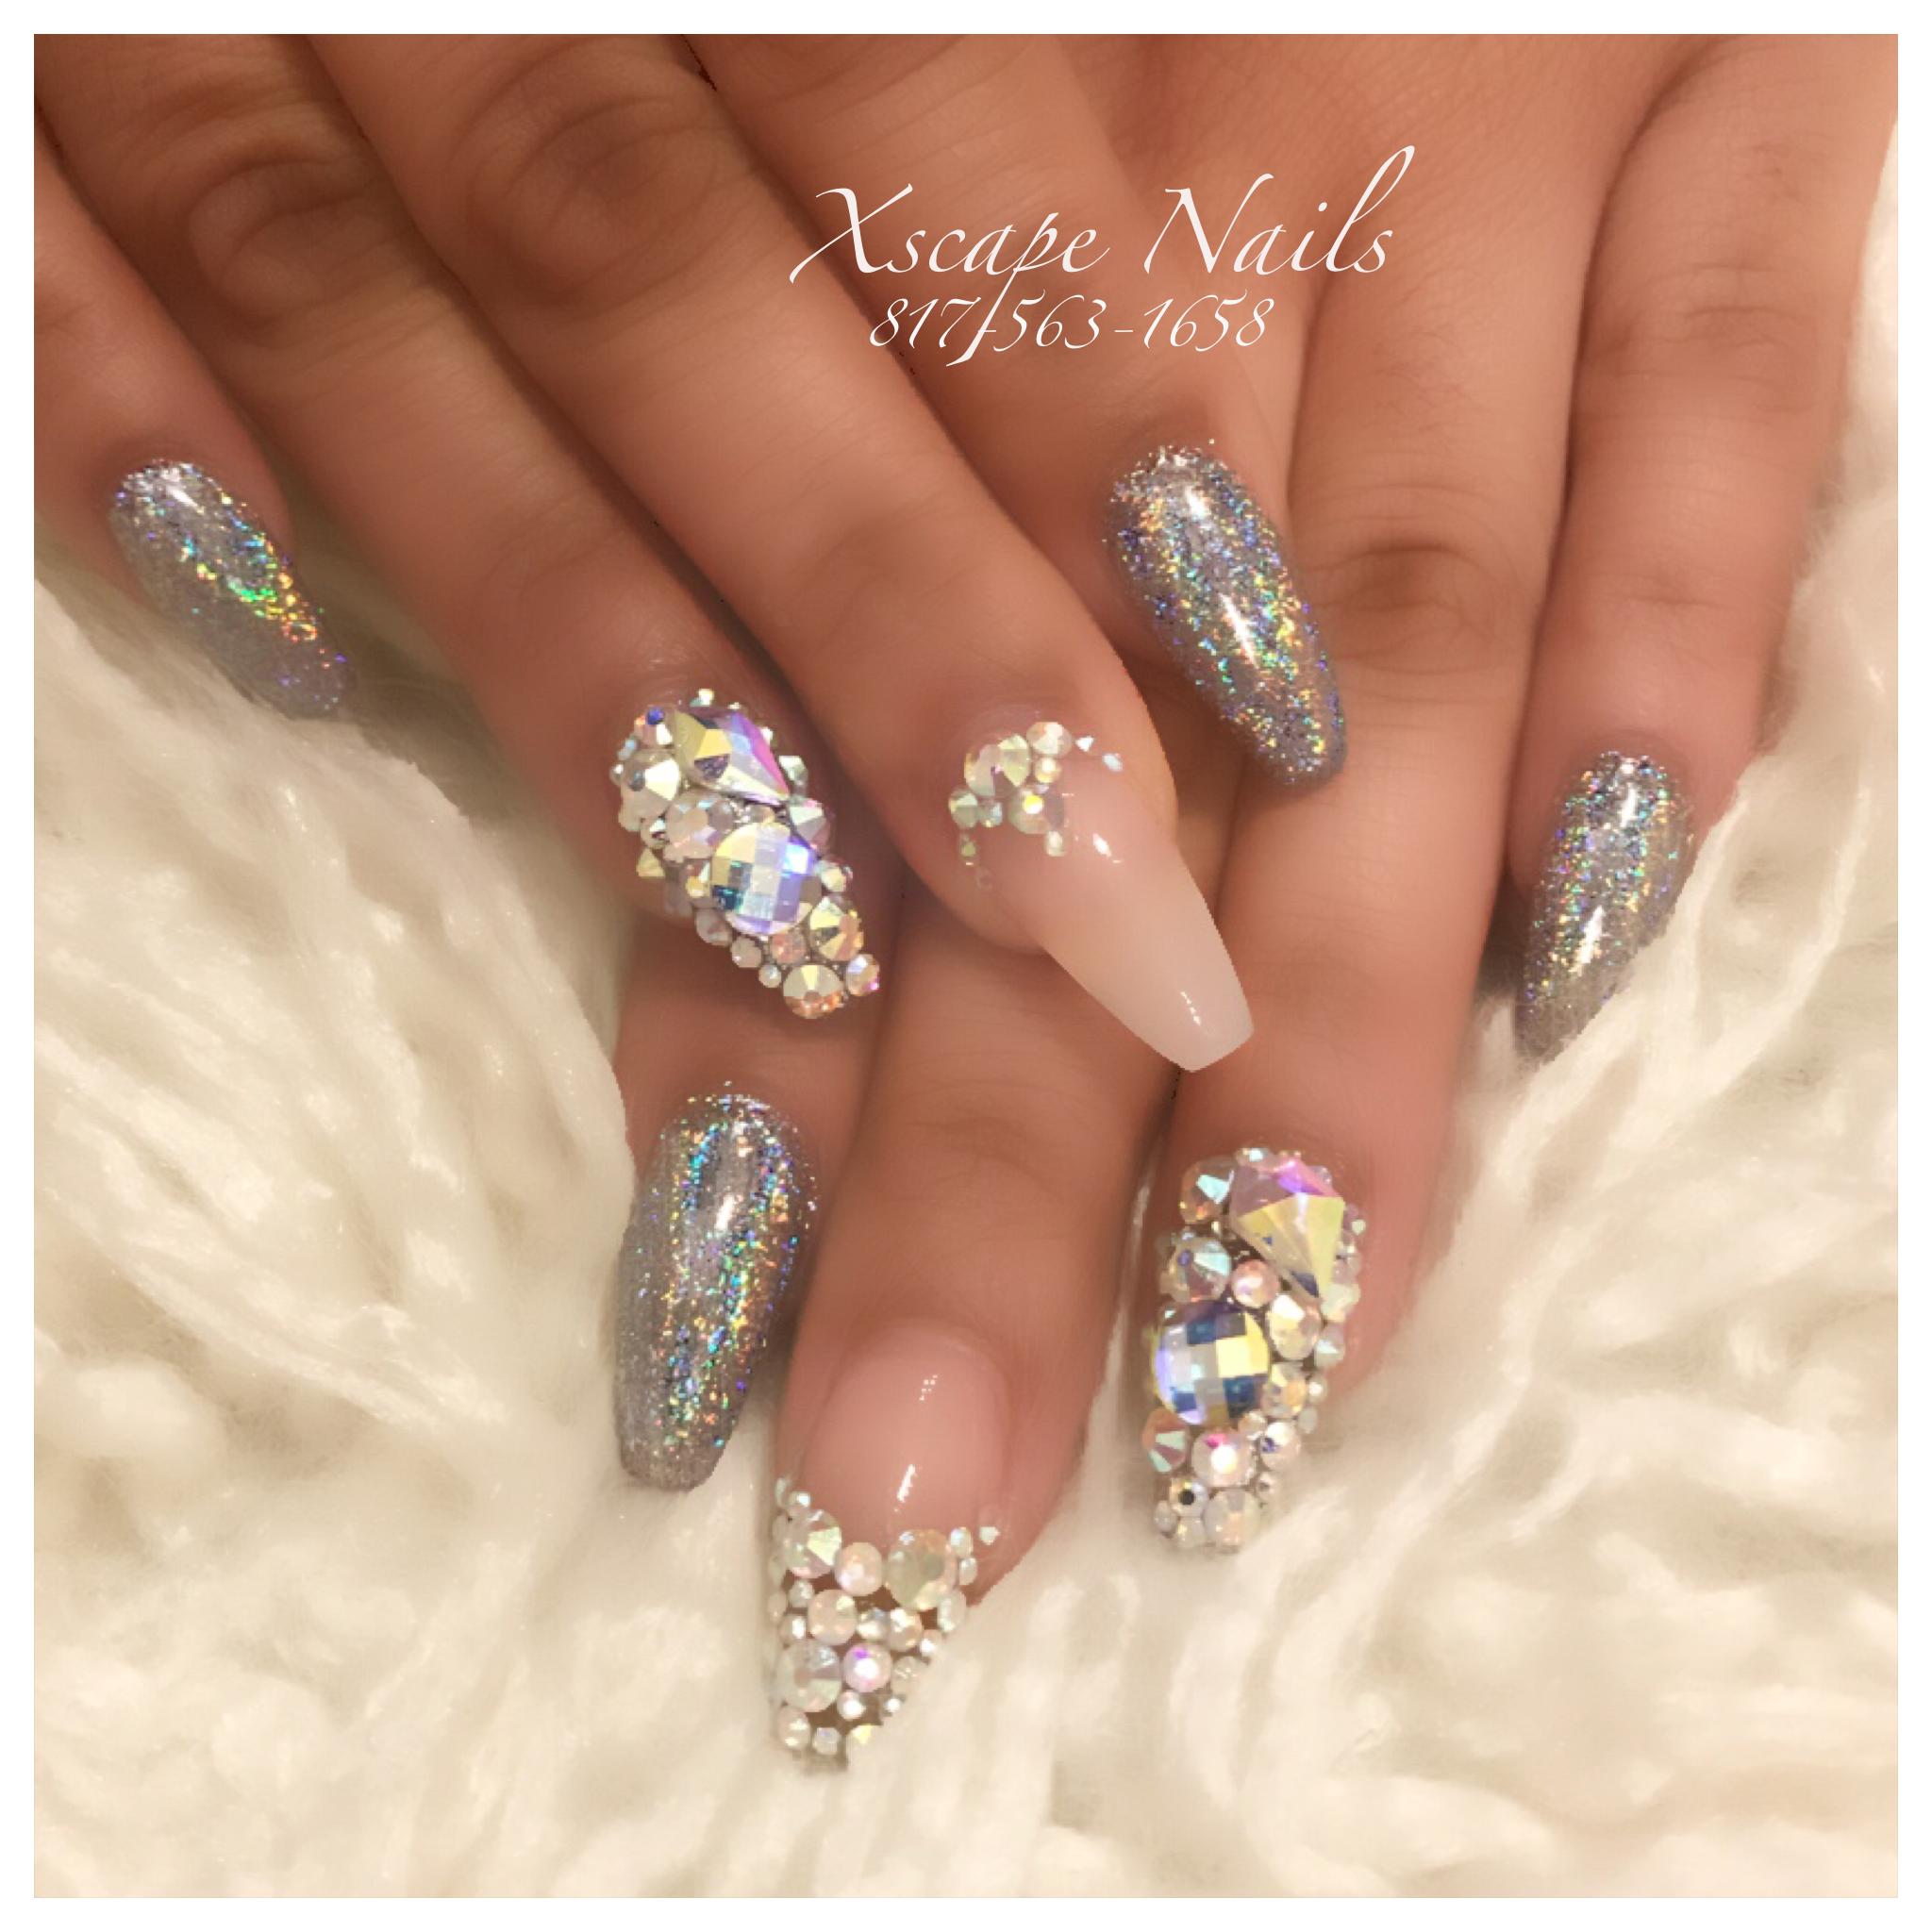 Galaxy chrome nails | js.uñas!!! | Pinterest | Chrome nails and ...